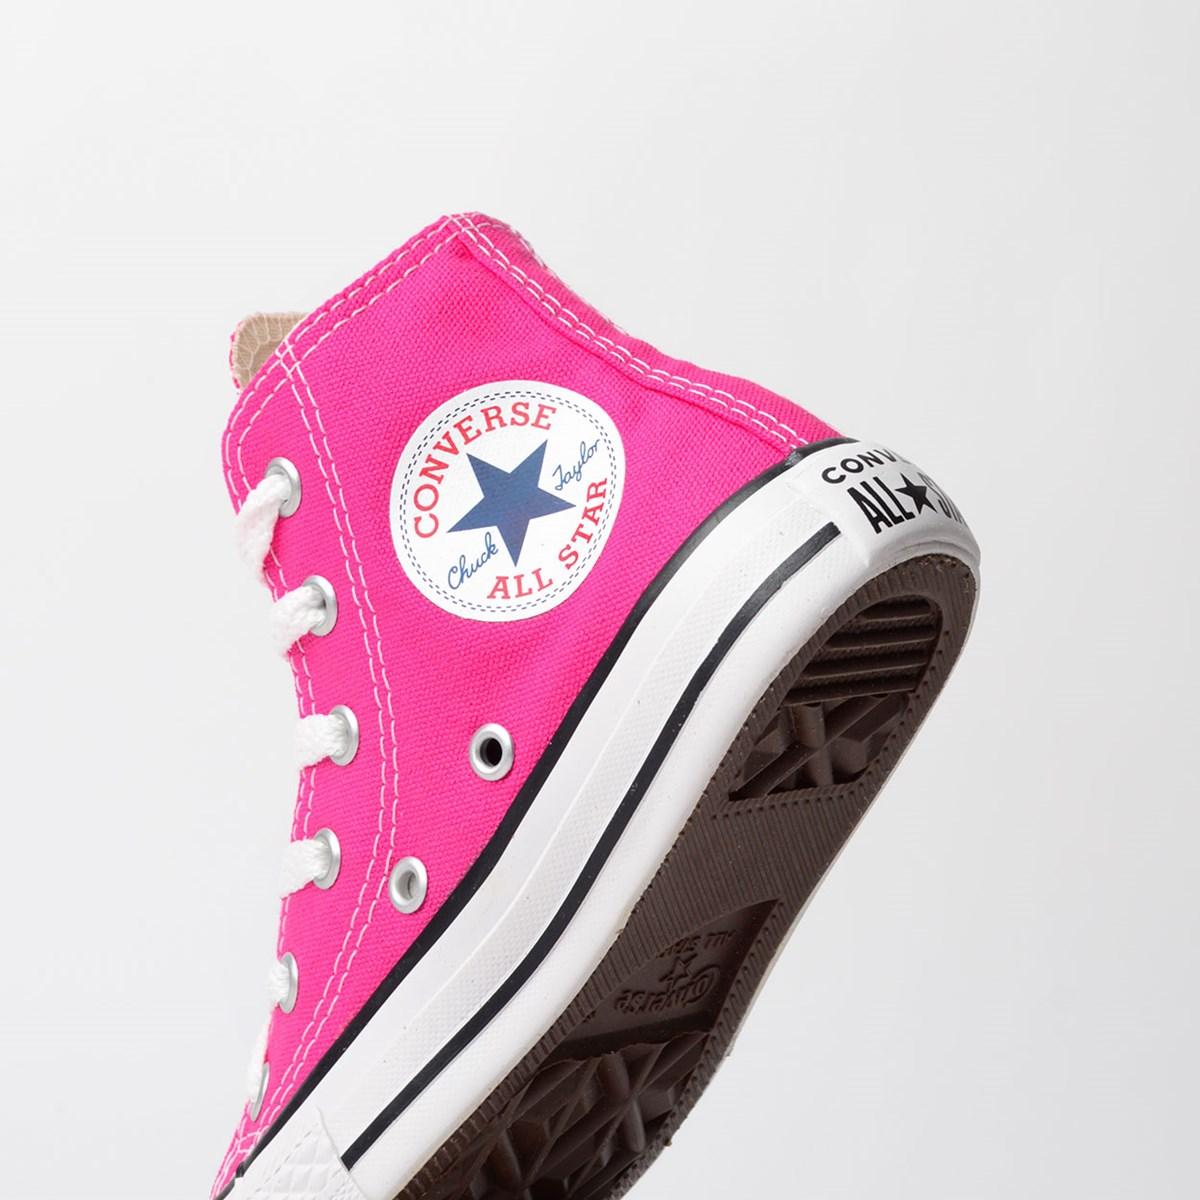 Tênis Converse Chuck Taylor All Star Seasonal Kids Pink Fluor CK04280018